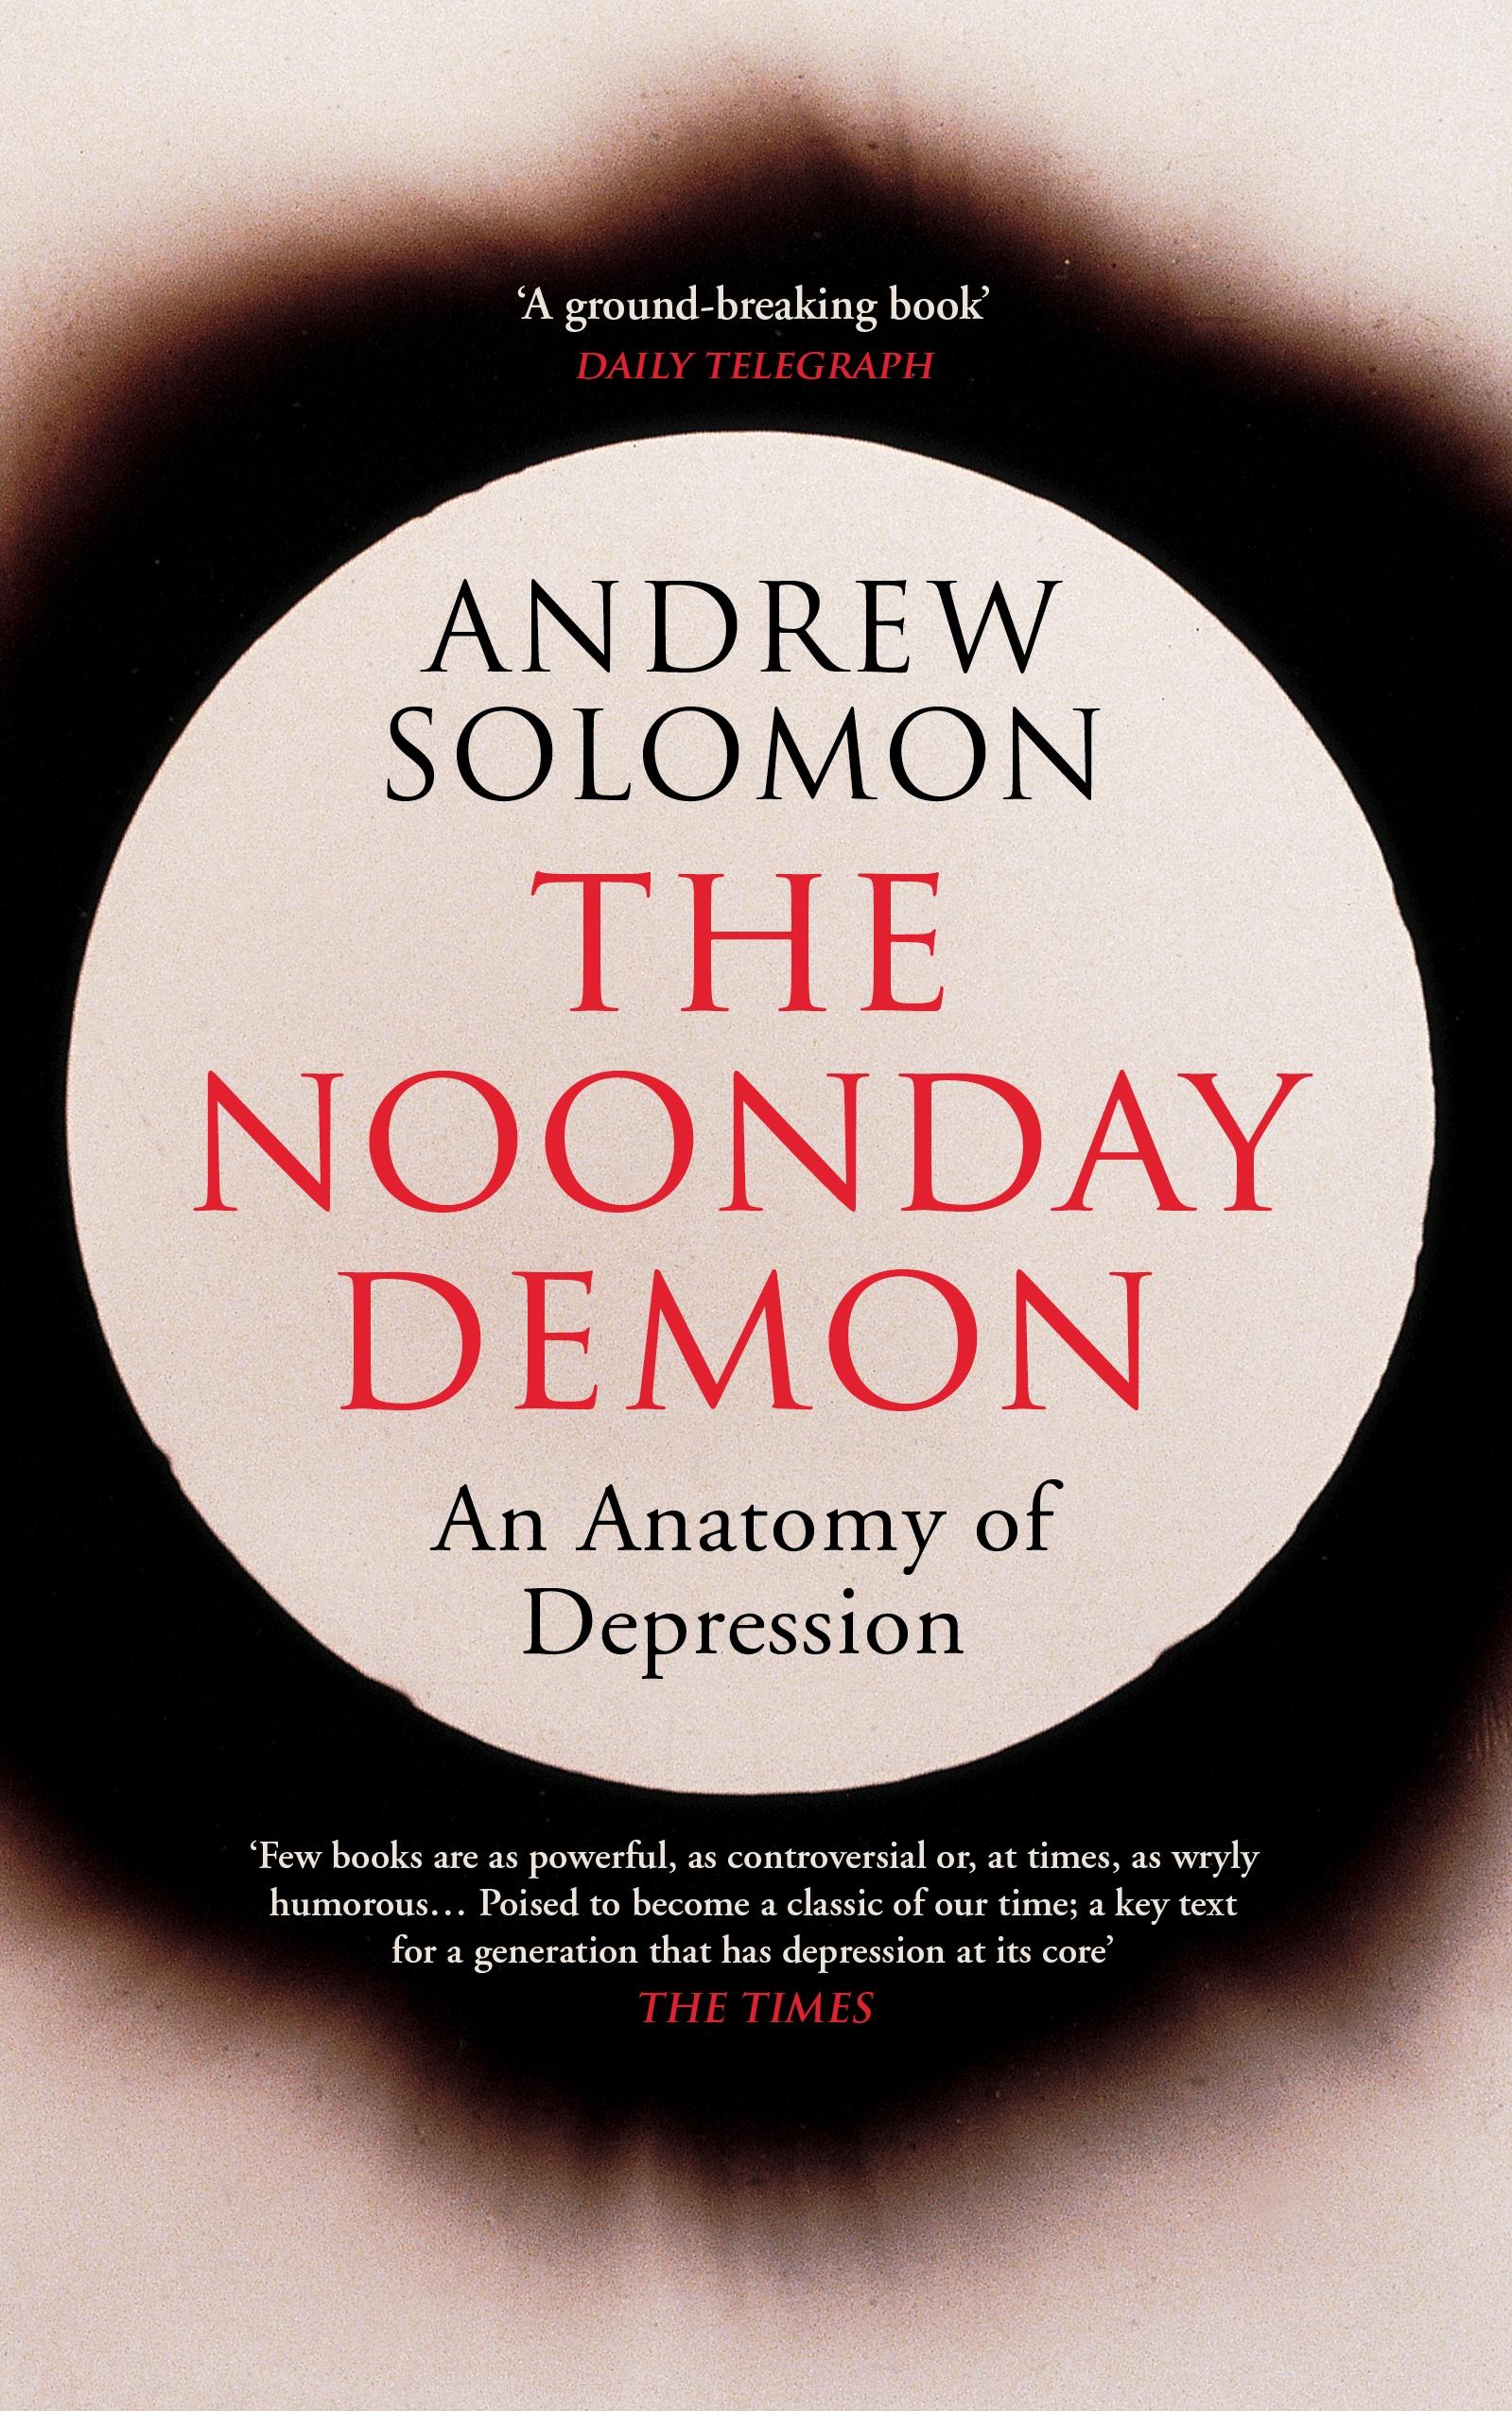 The Noonday Demon by Andrew Solomon - Penguin Books New Zealand